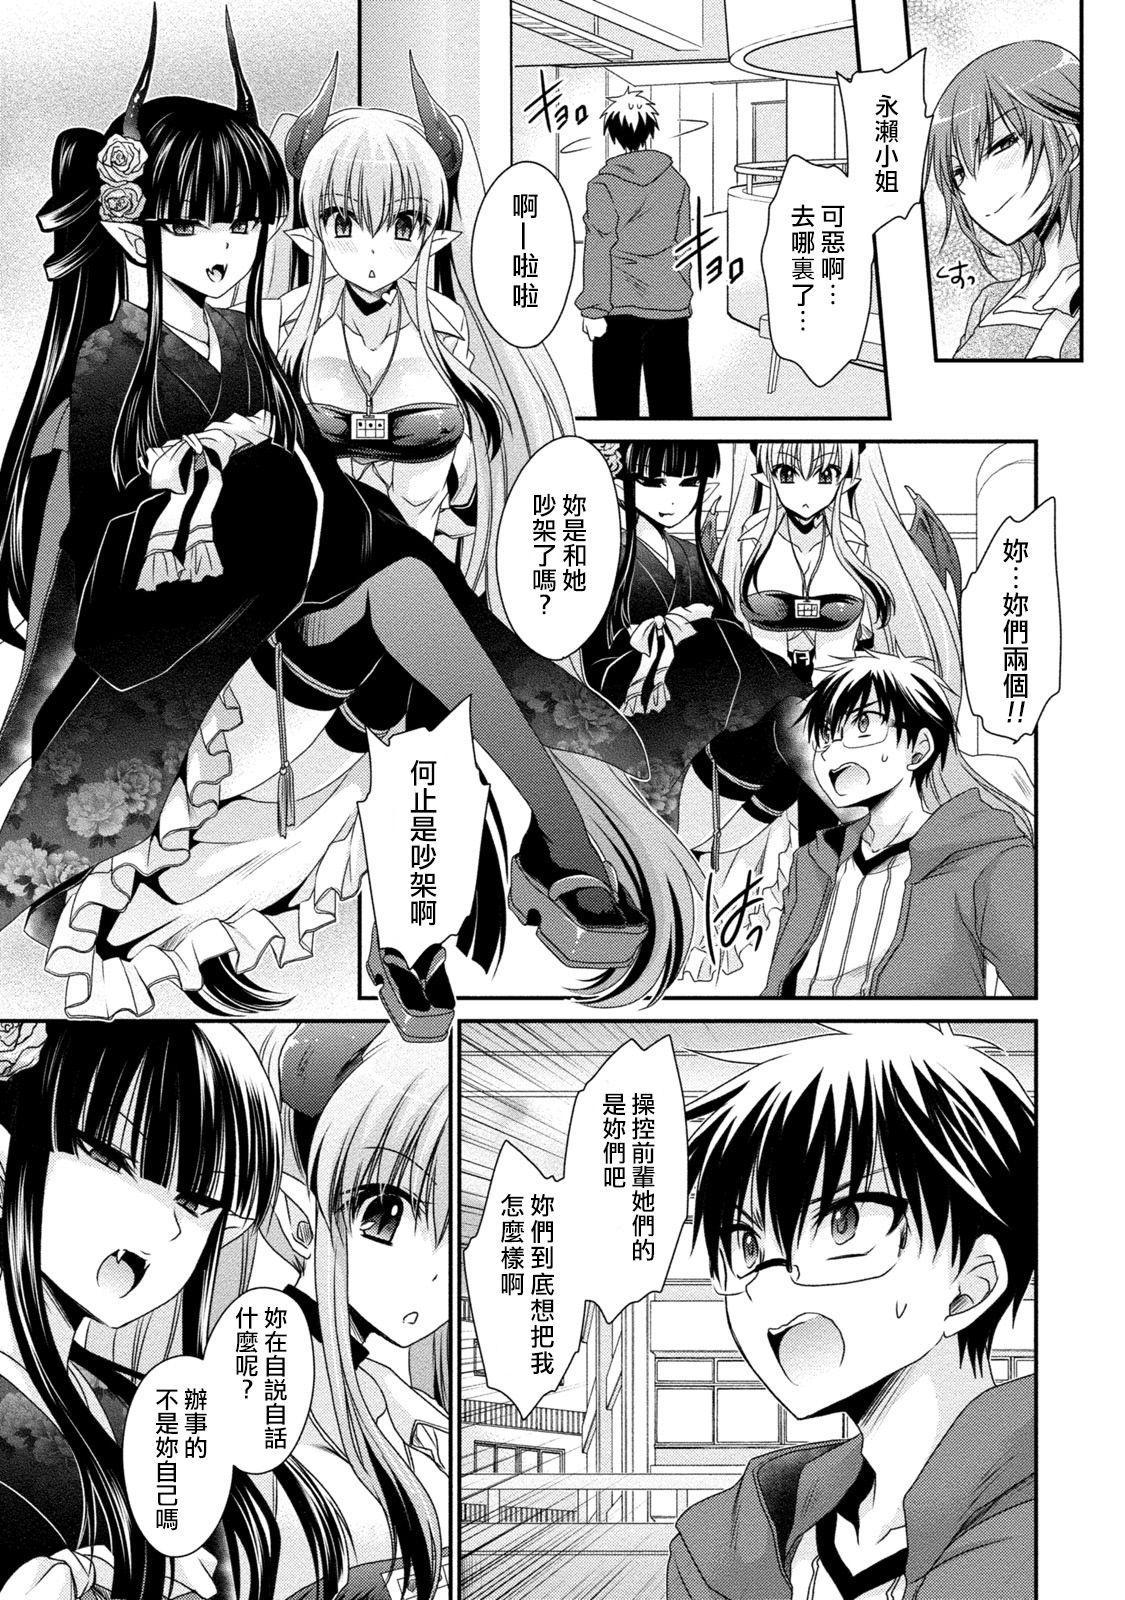 [Shinonome Ryu] Ore to Kanojo to Owaru Sekai - World's end LoveStory ch.10-13 [Chinese] [爱弹幕汉化组] [Digital] 72